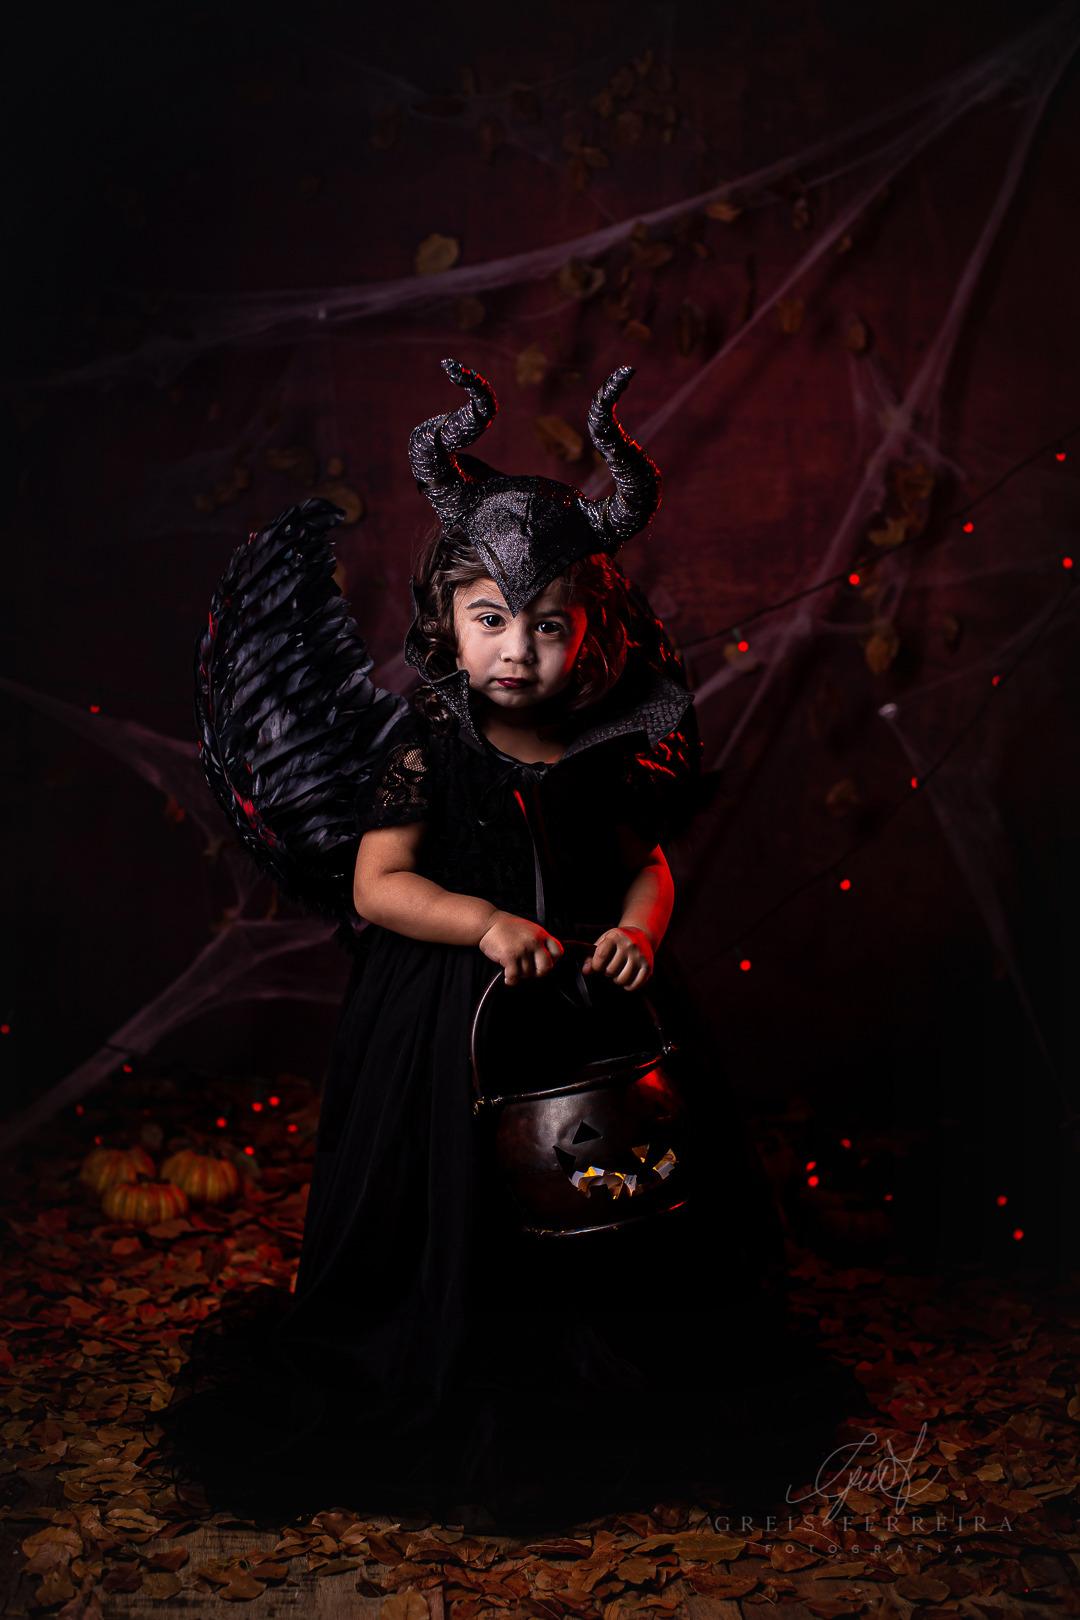 ensaio infantil em bh halloween malevola